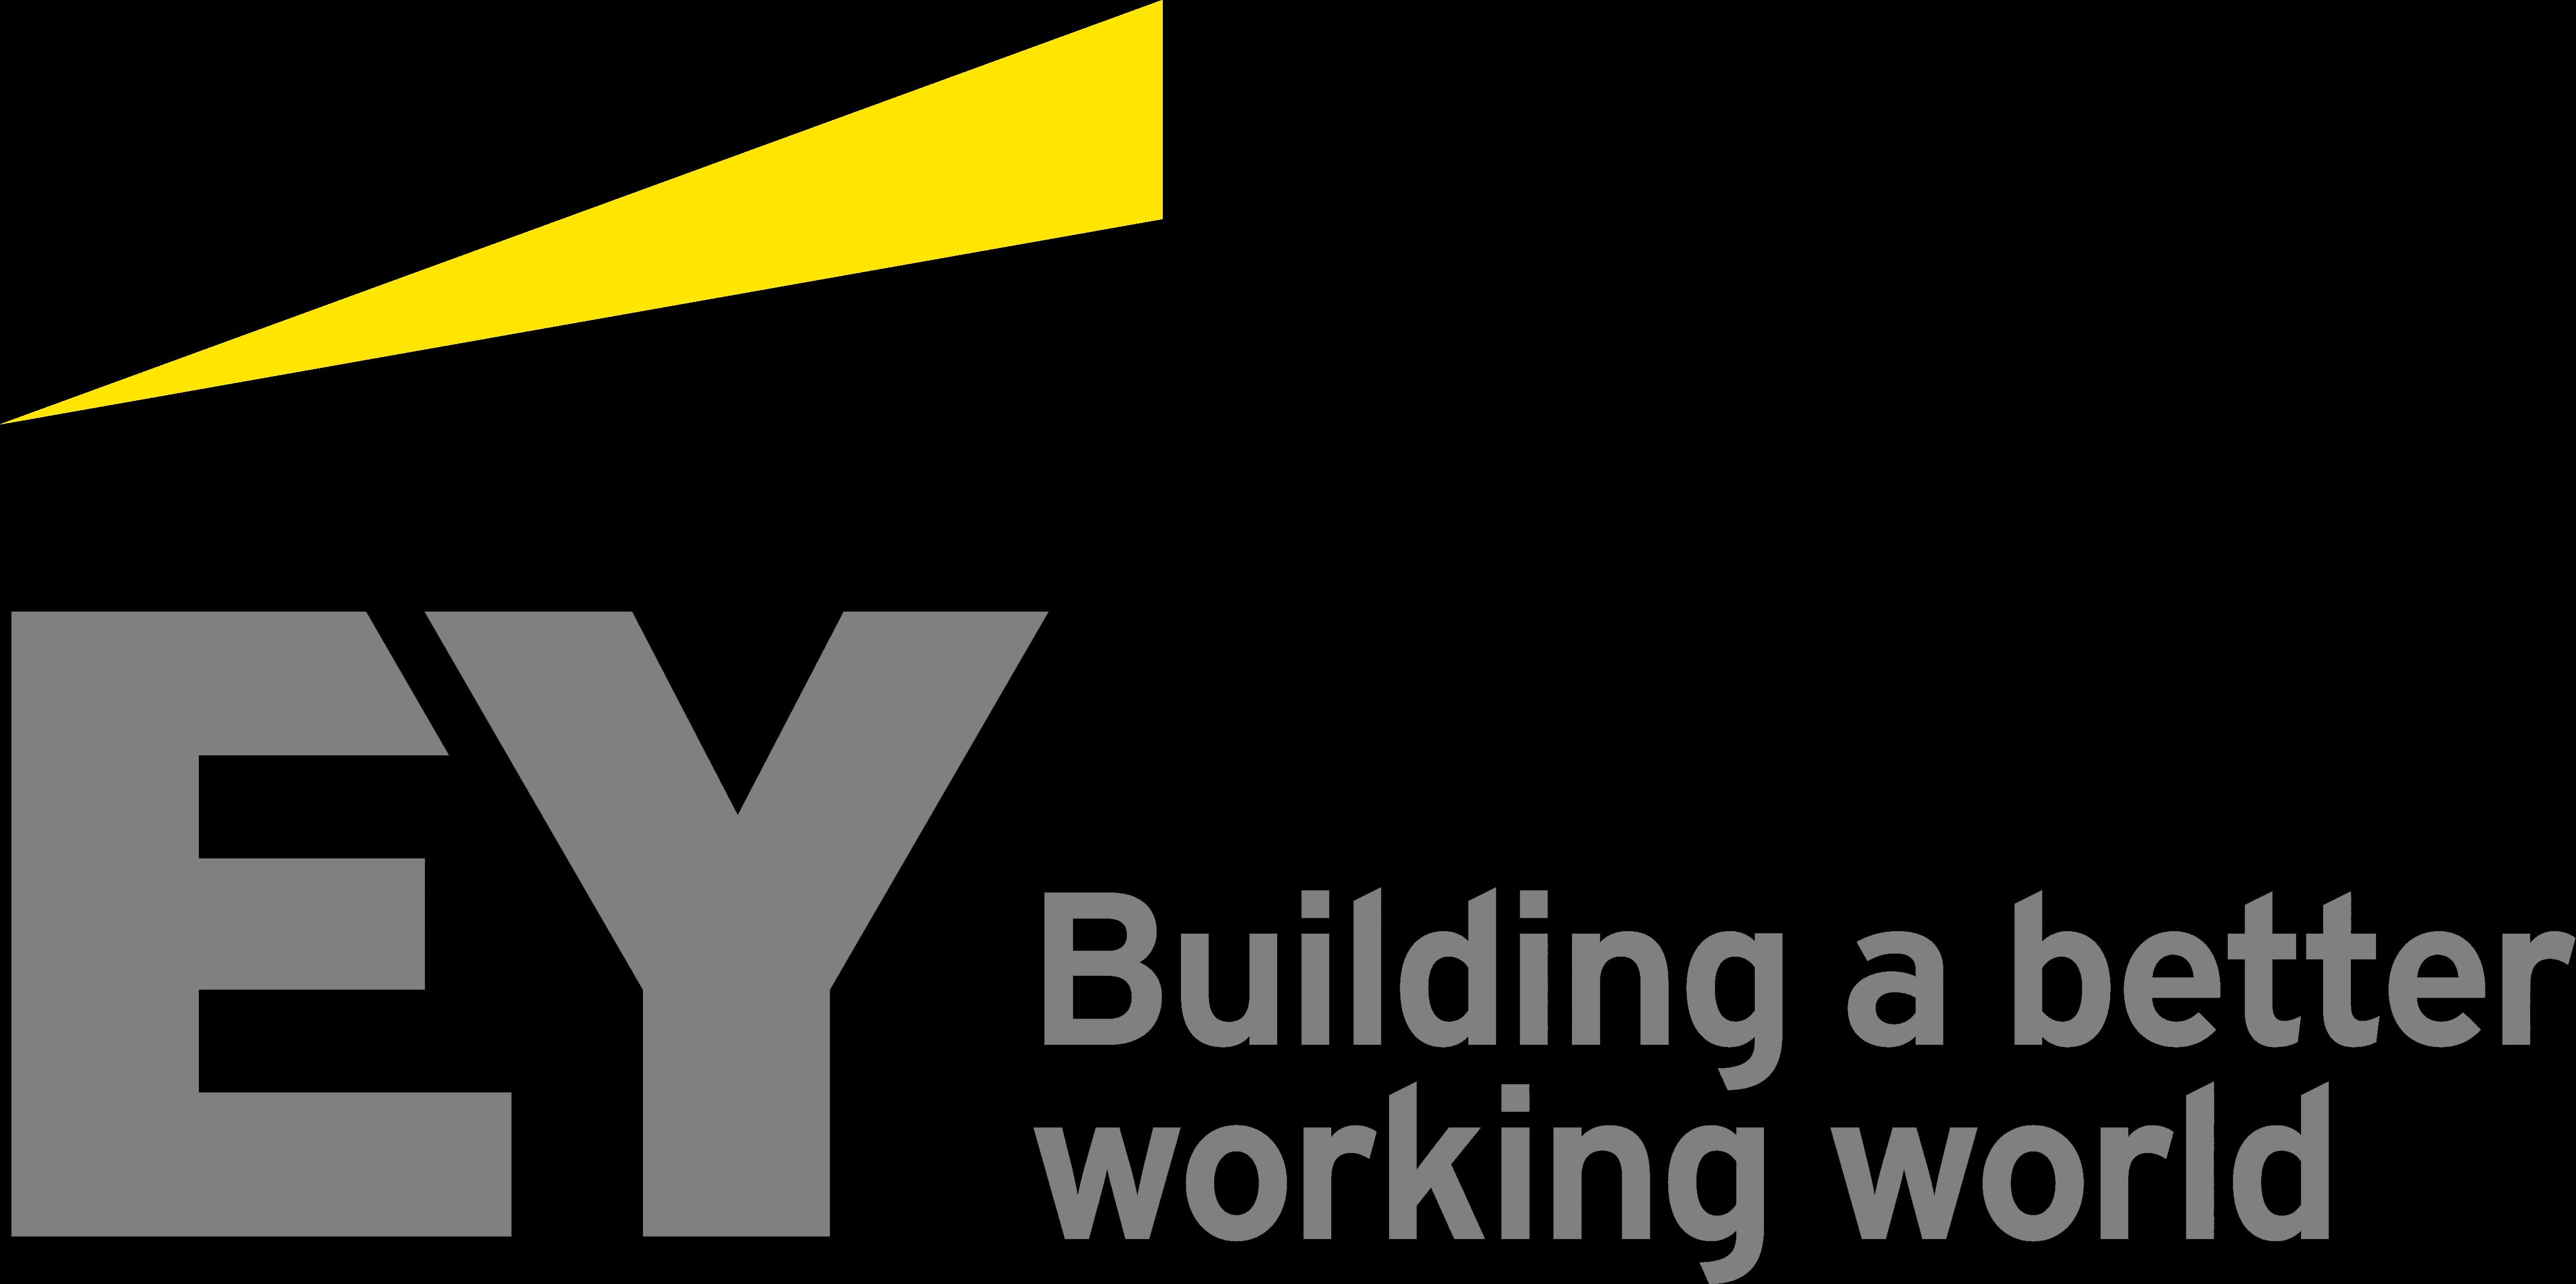 https://kwikkiangie.ac.id/home/wp-content/uploads/2020/07/EY_logo_slogan.png